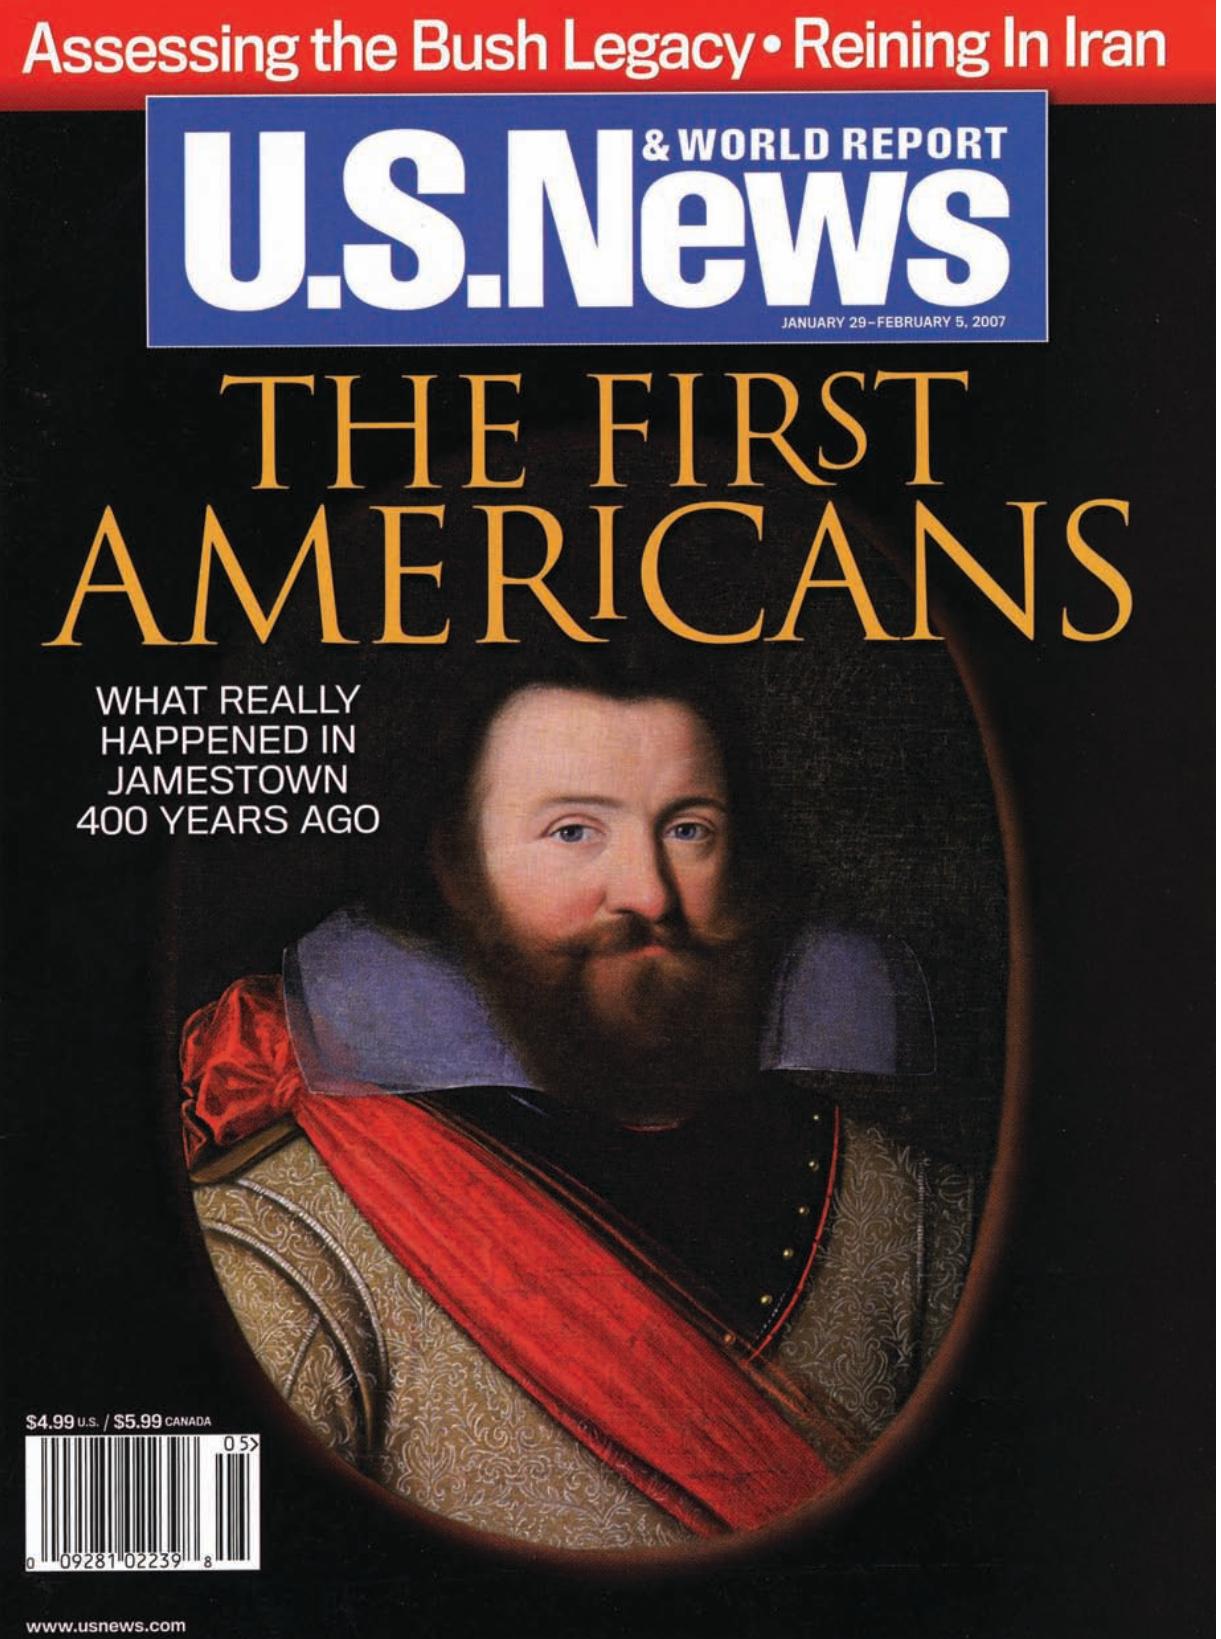 U.S. News & World Report, January 29-February 5, 2007, issue.